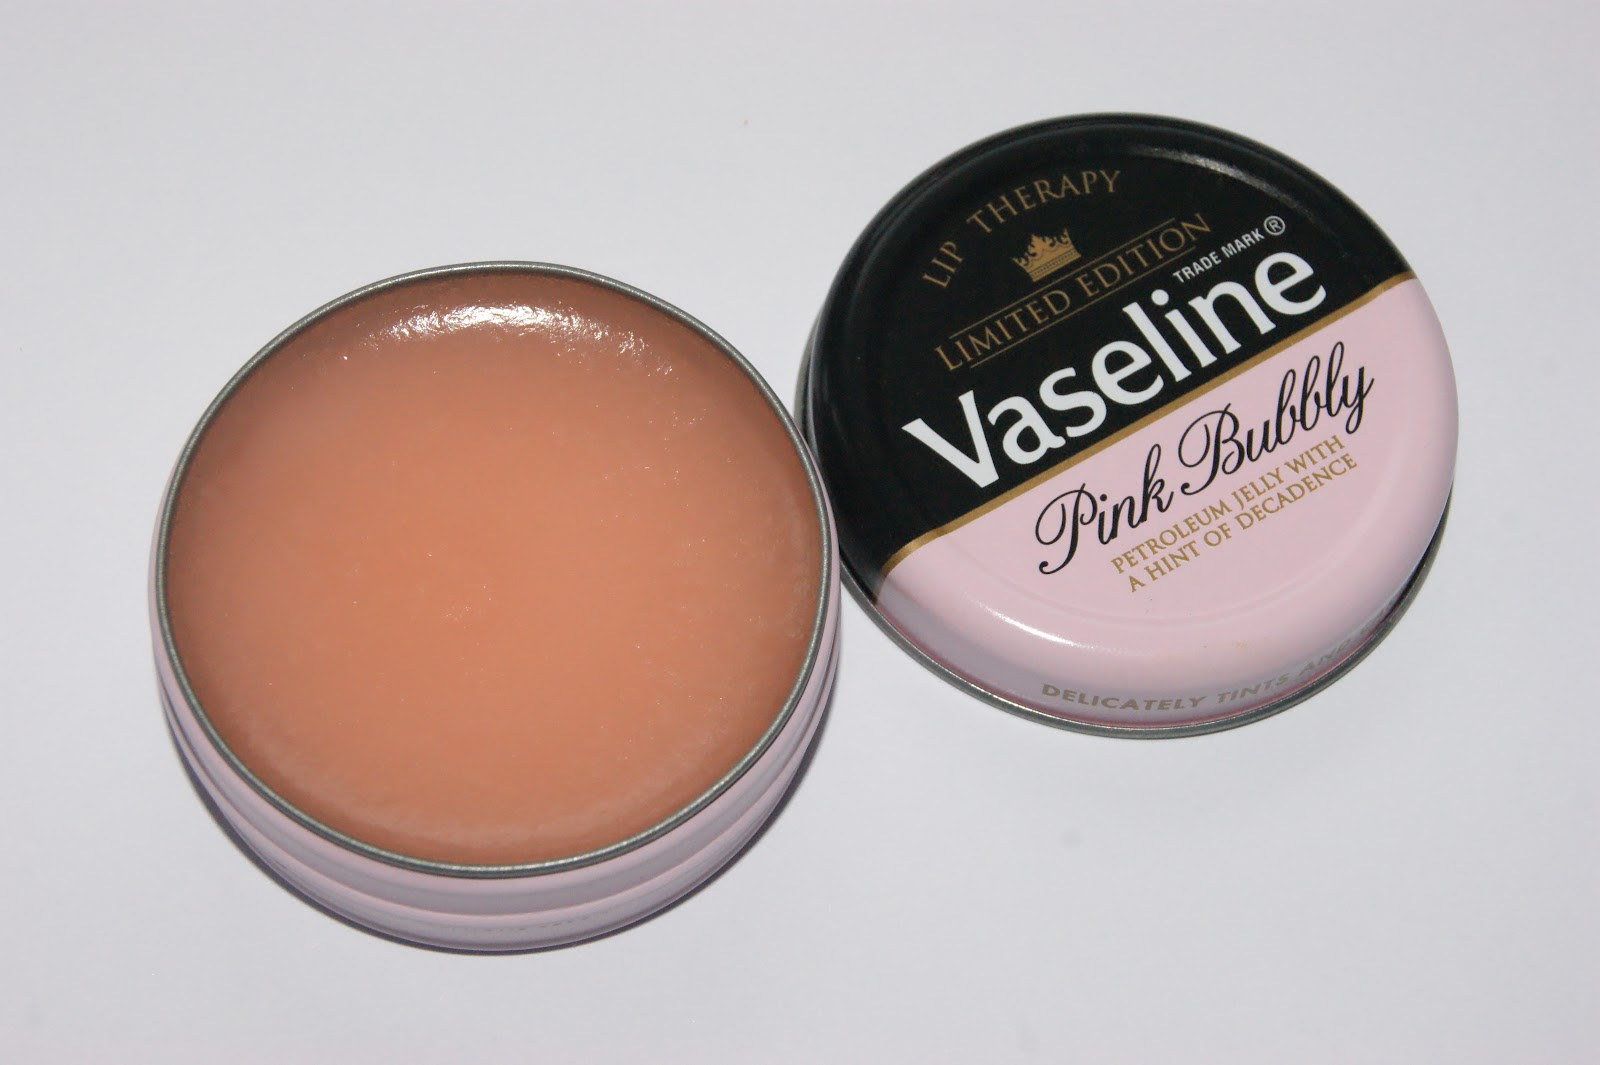 http://4.bp.blogspot.com/-H_H3u_OJQsY/UFs3mQ6L_jI/AAAAAAAAcjI/0eFKuZLYpjc/s1600/Vaseline+Pink+Bubbly+Lip+Therapy+Review+003.jpg